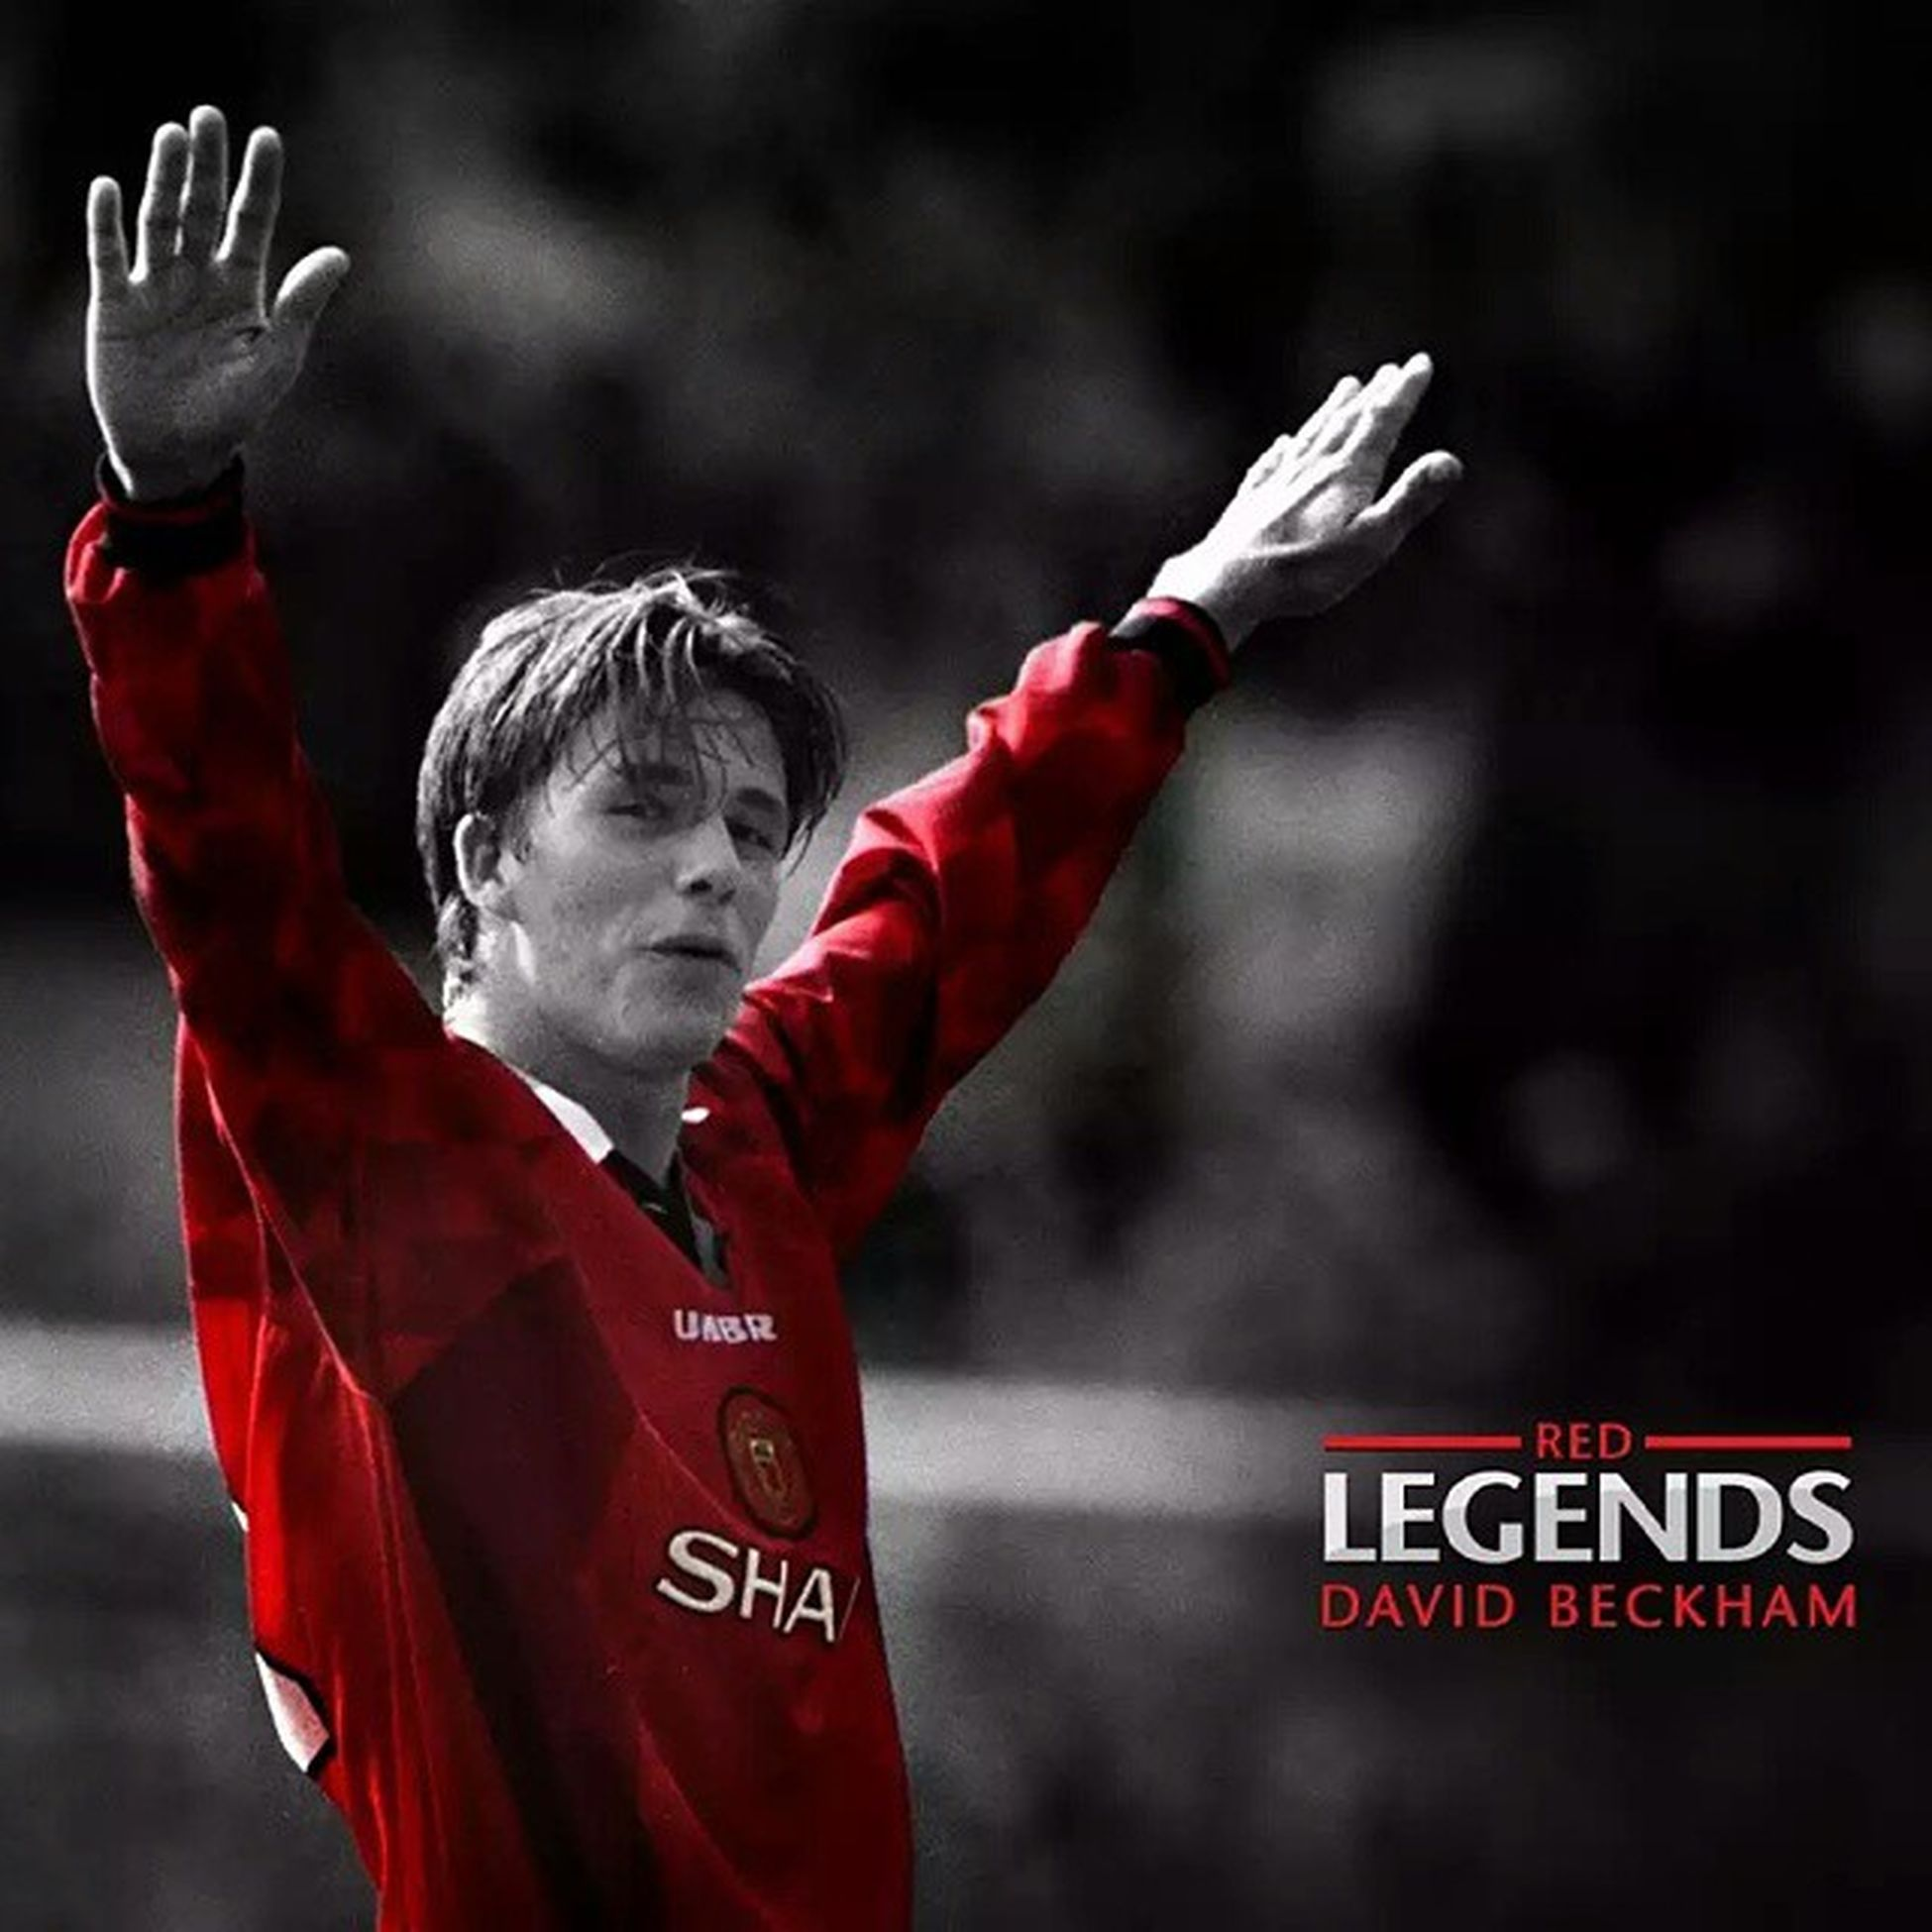 Happy Birthday David Beckham!! Football's original superstar GGMU DB40